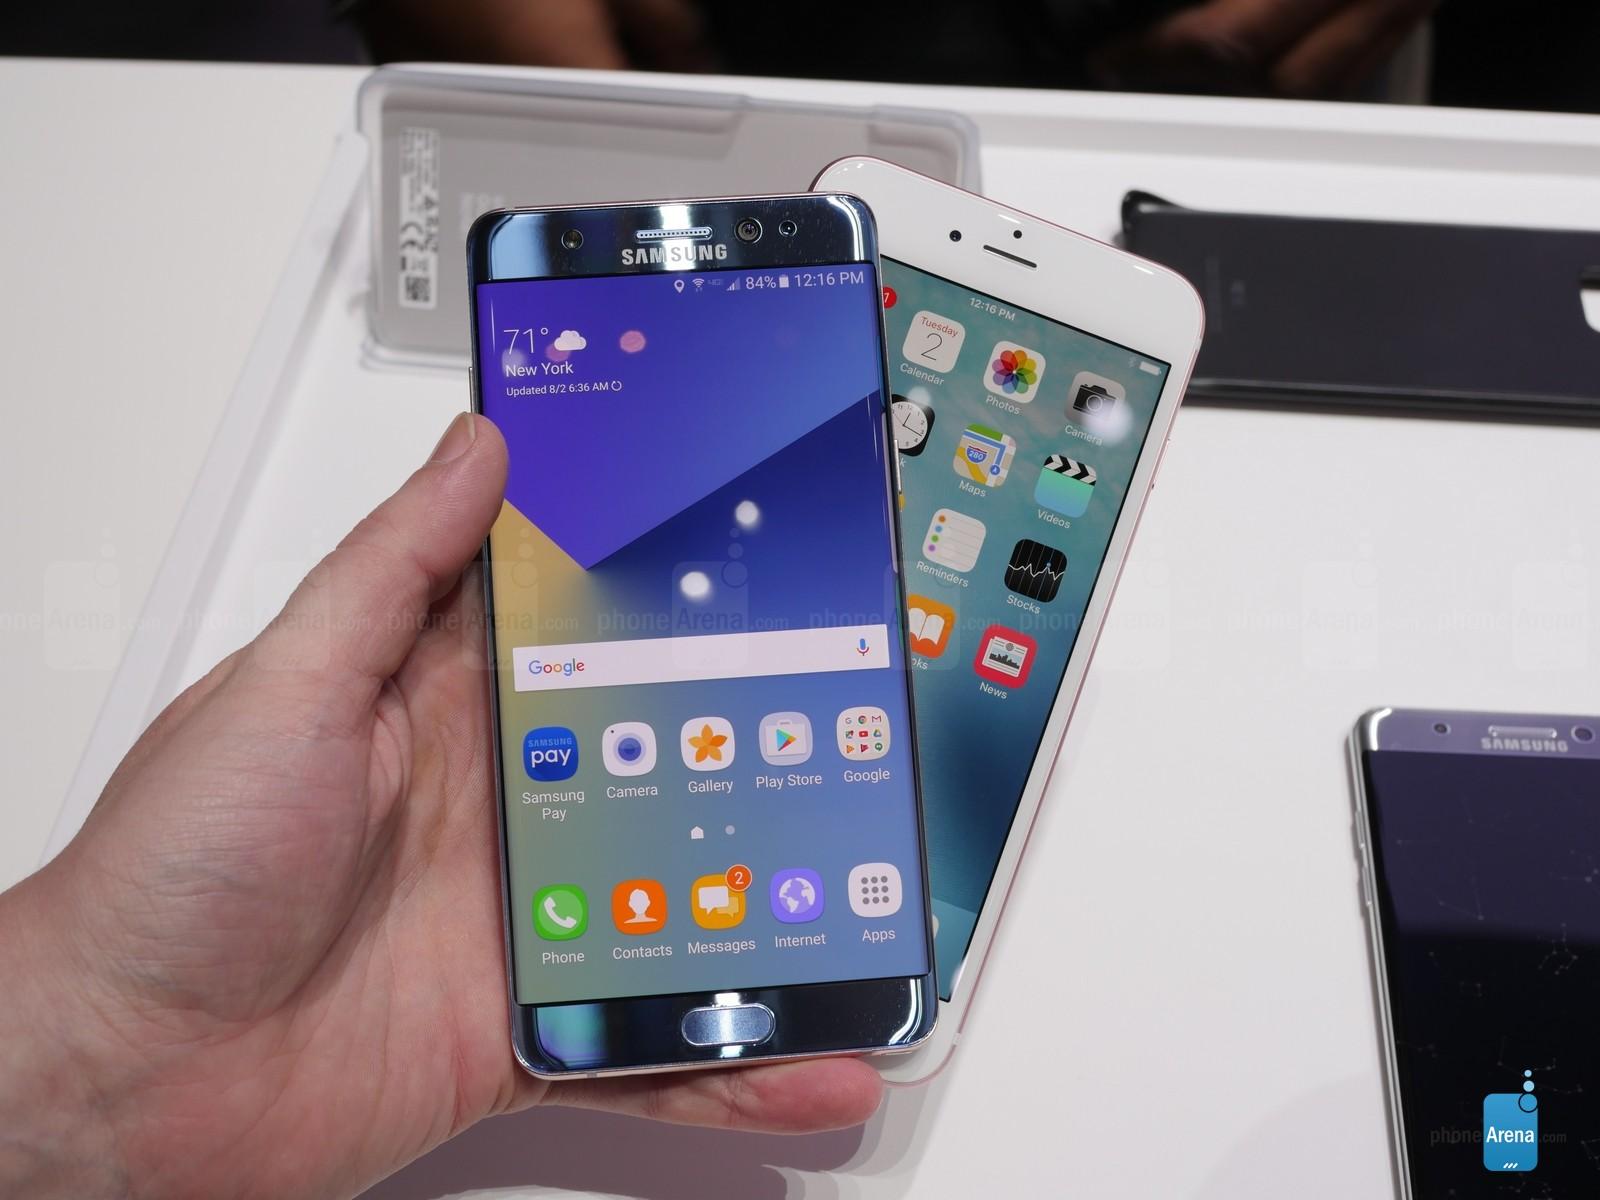 Samsung-Galaxy-Note-7-vs-Apple-iPhone-6s-Plus